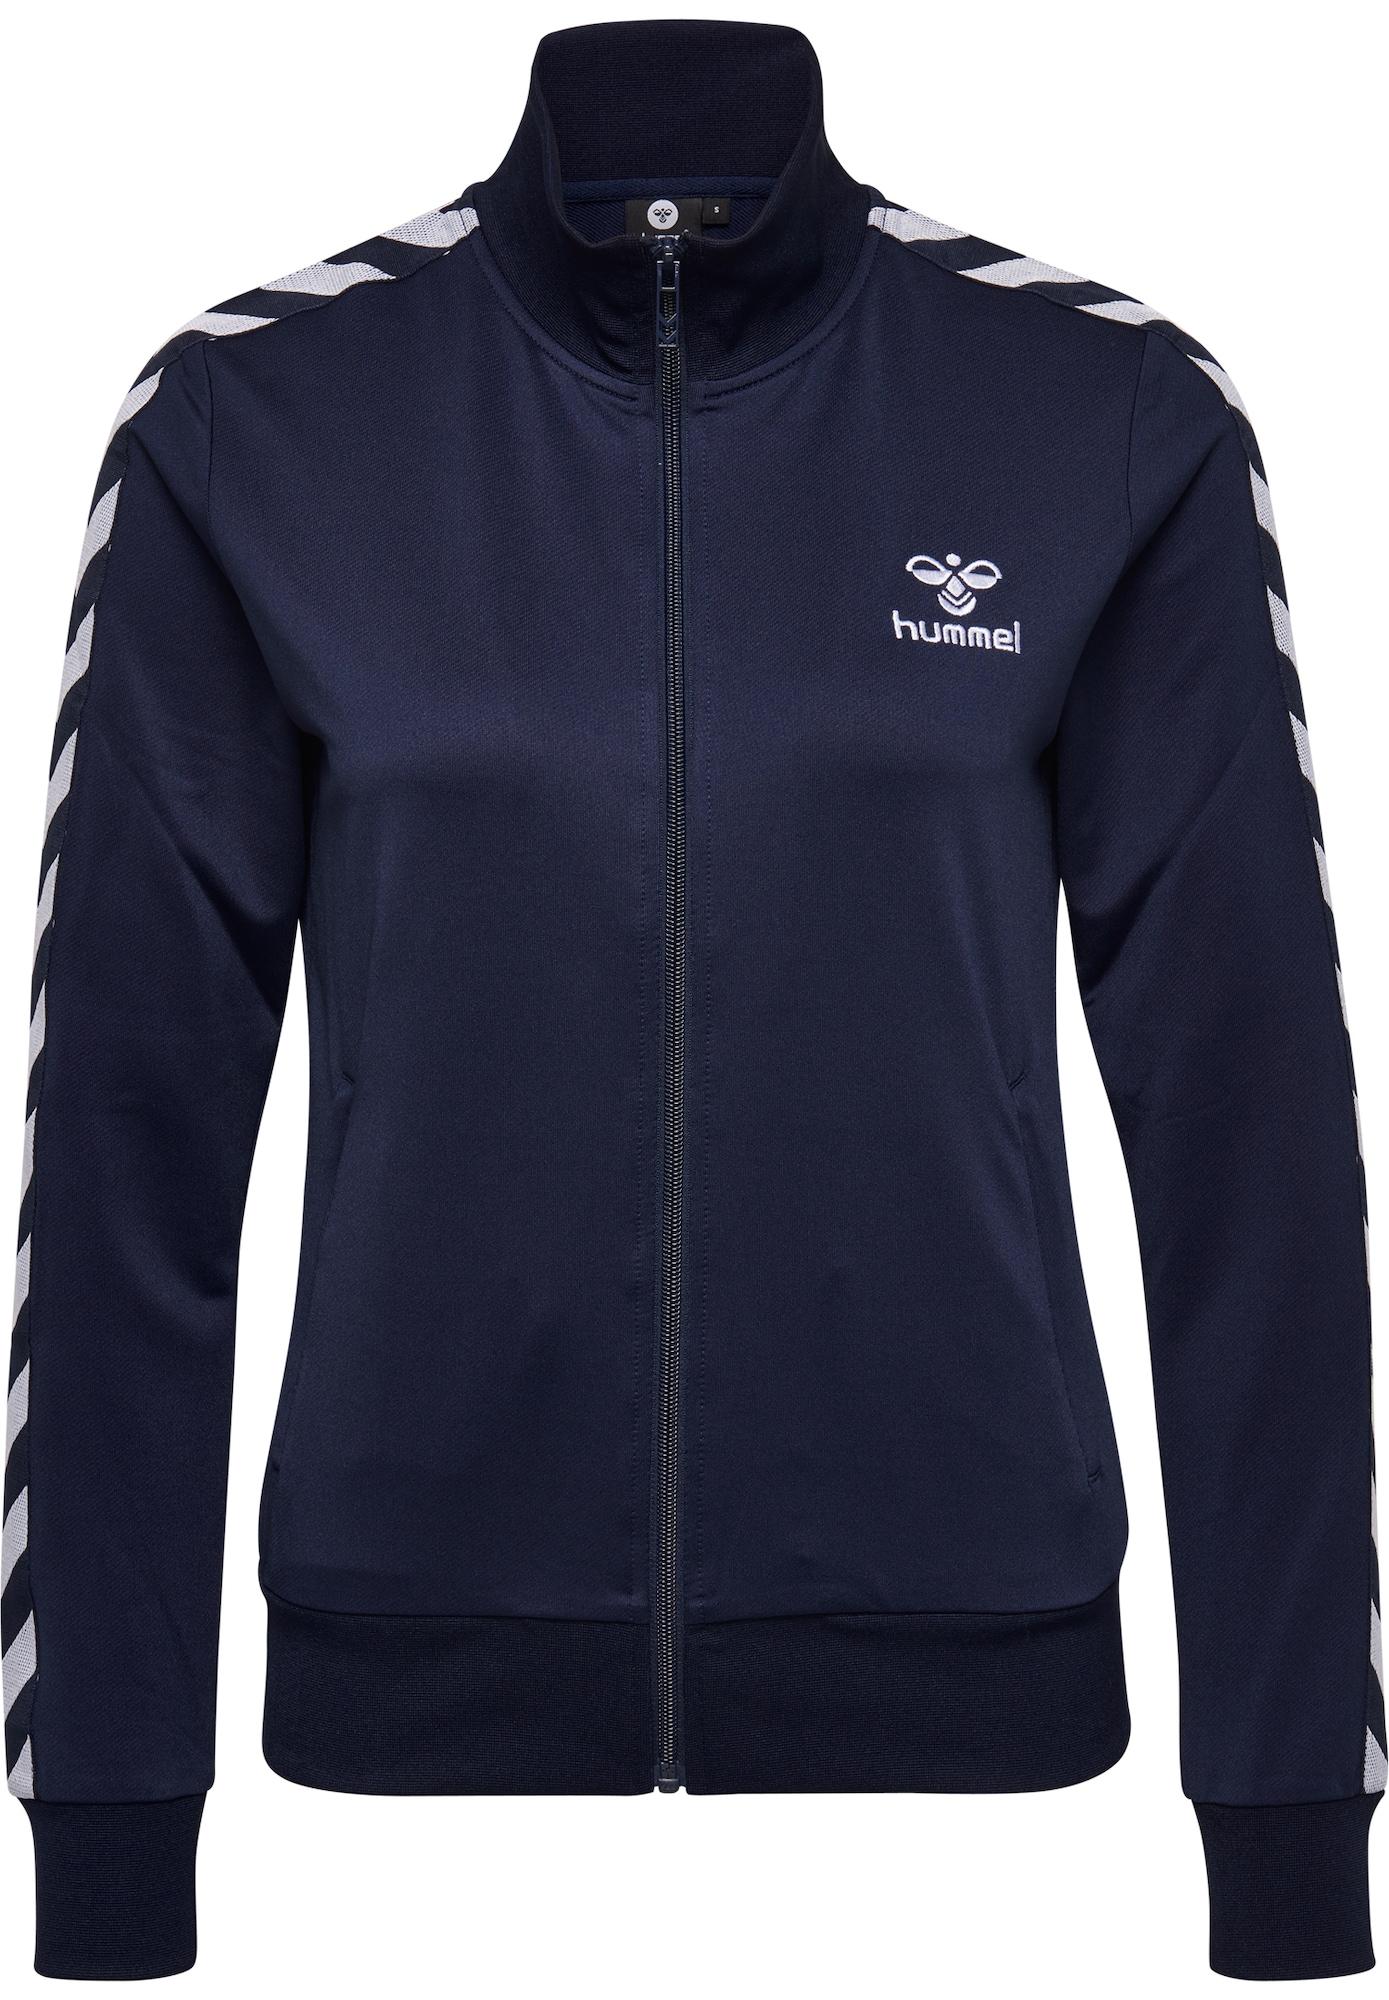 Zip Jacket | Sportbekleidung > Sportwesten > Steppwesten | Hummel